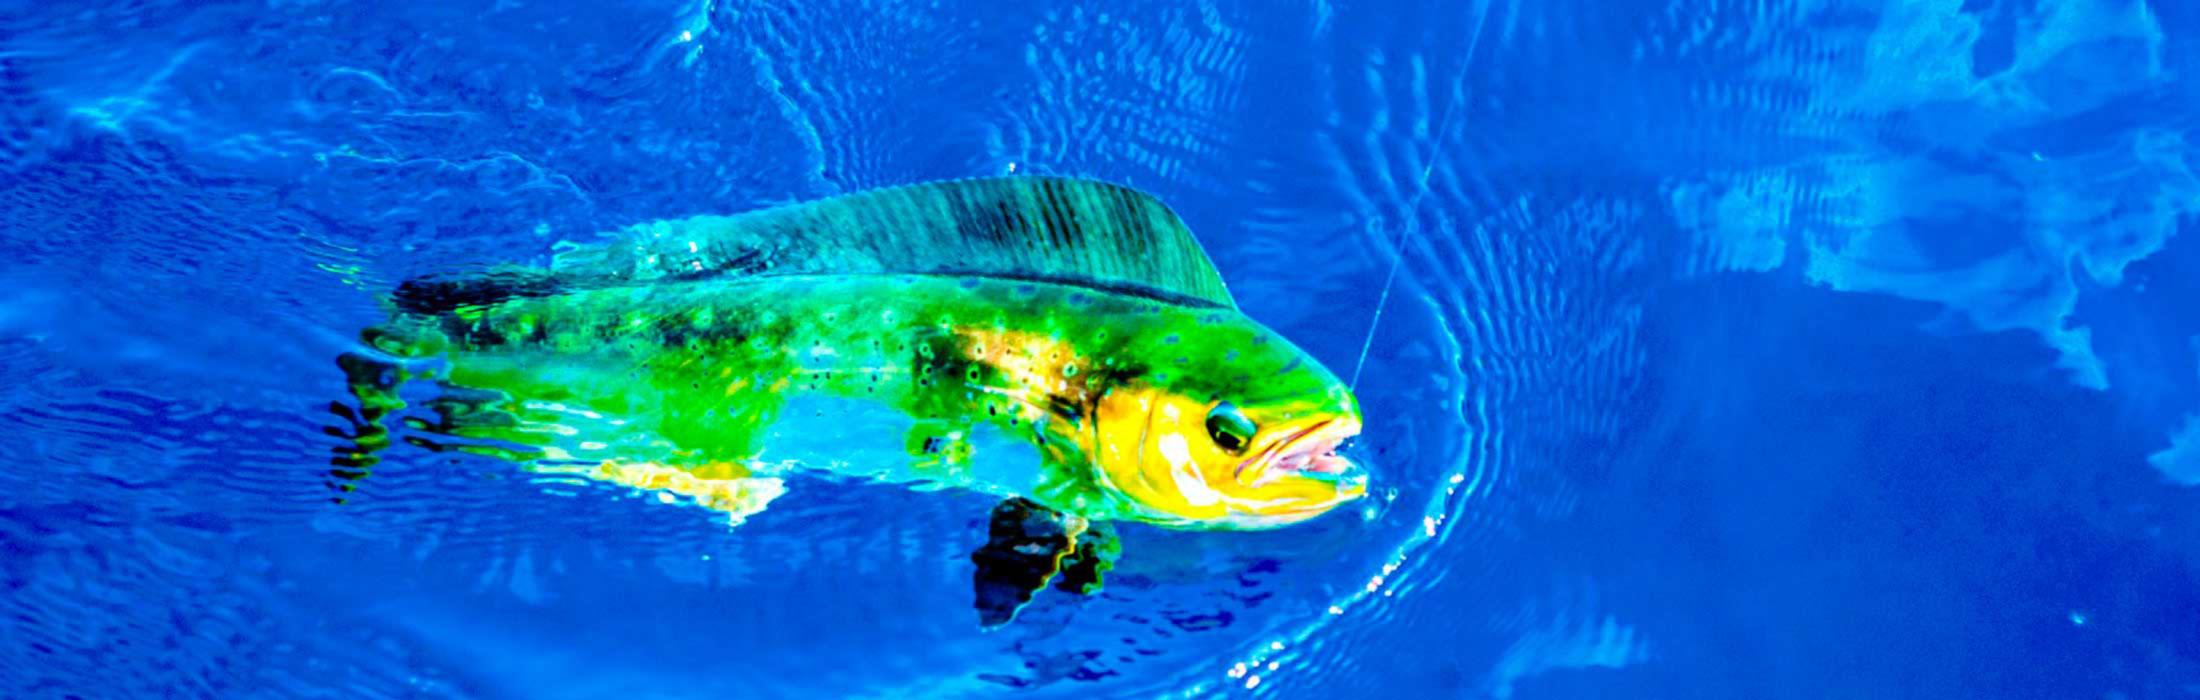 dolphinefish